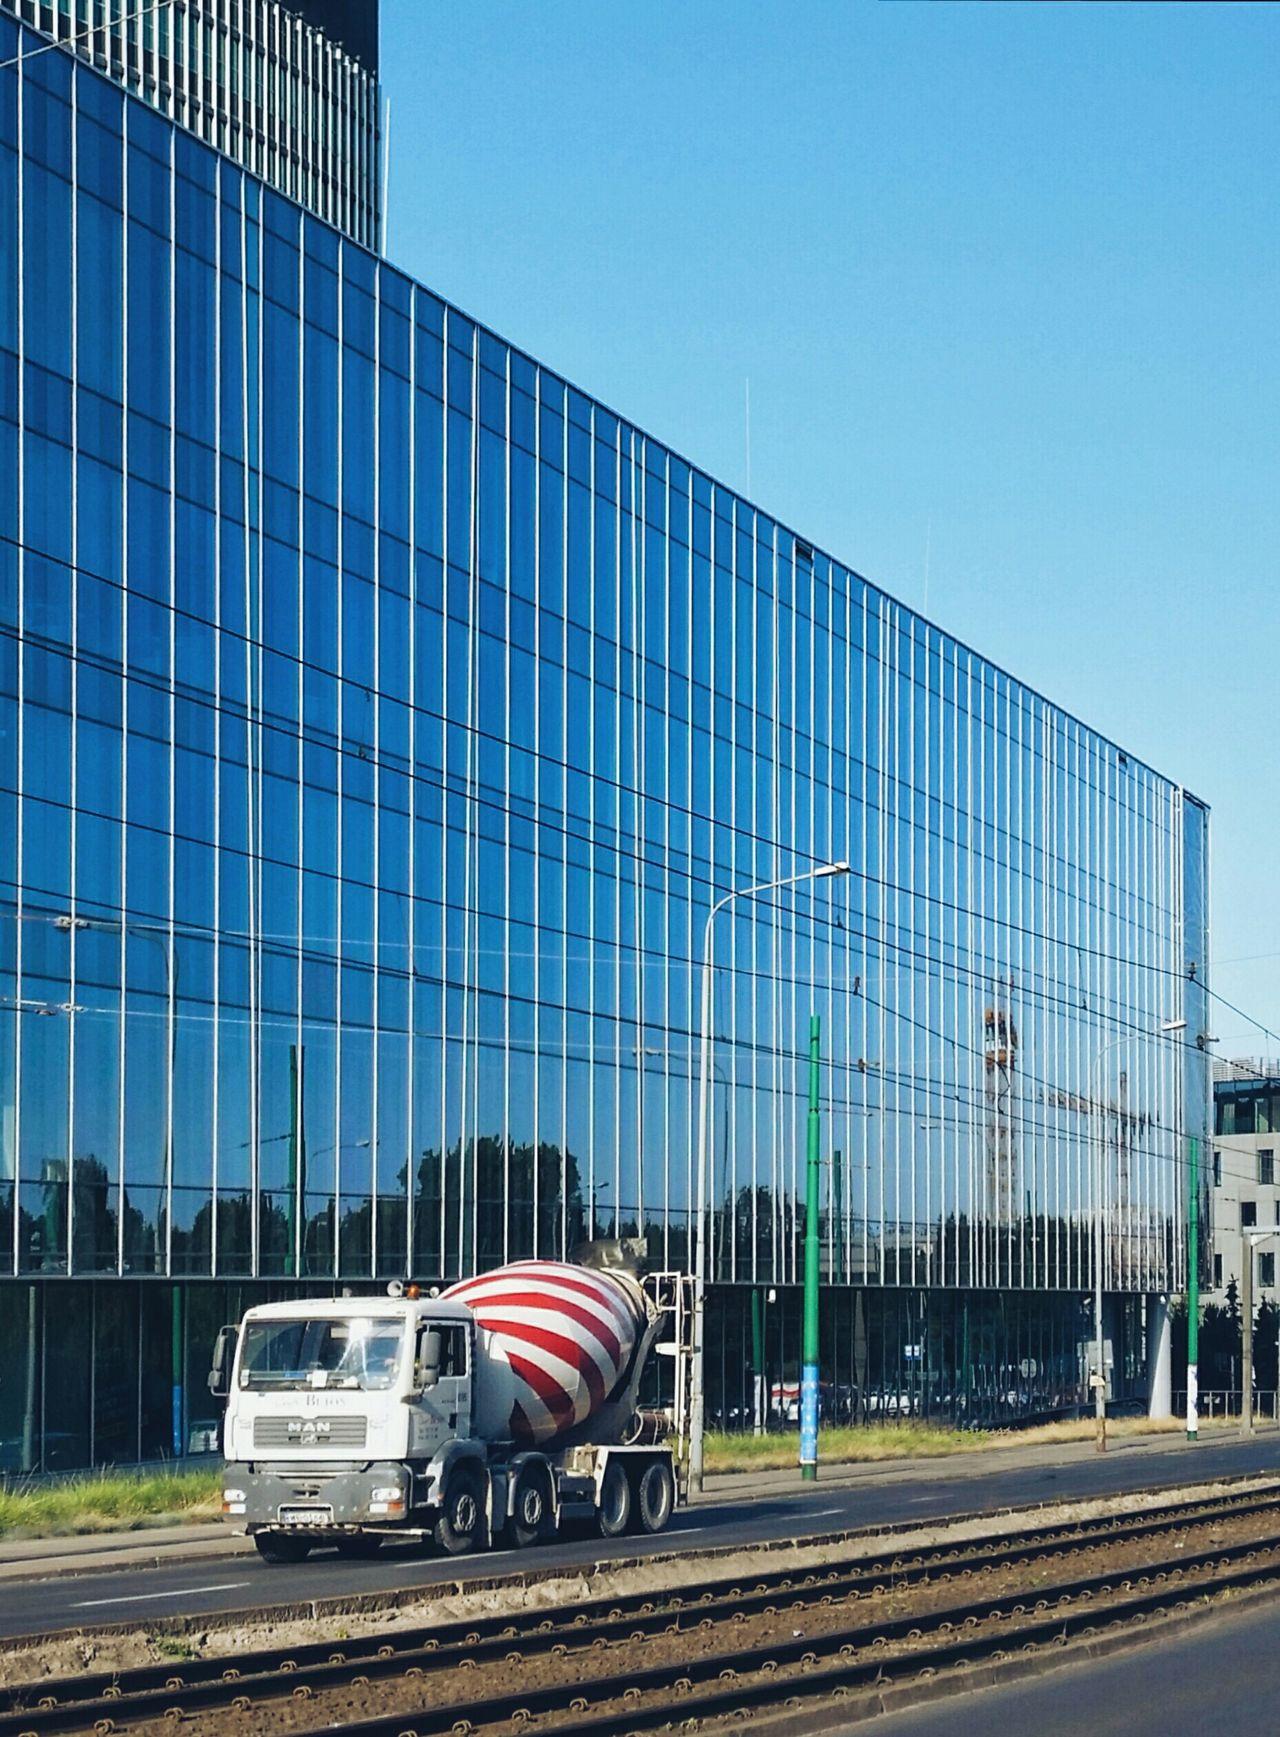 Beautiful stock photos of glas, Architecture, Blue, Building, Building Exterior